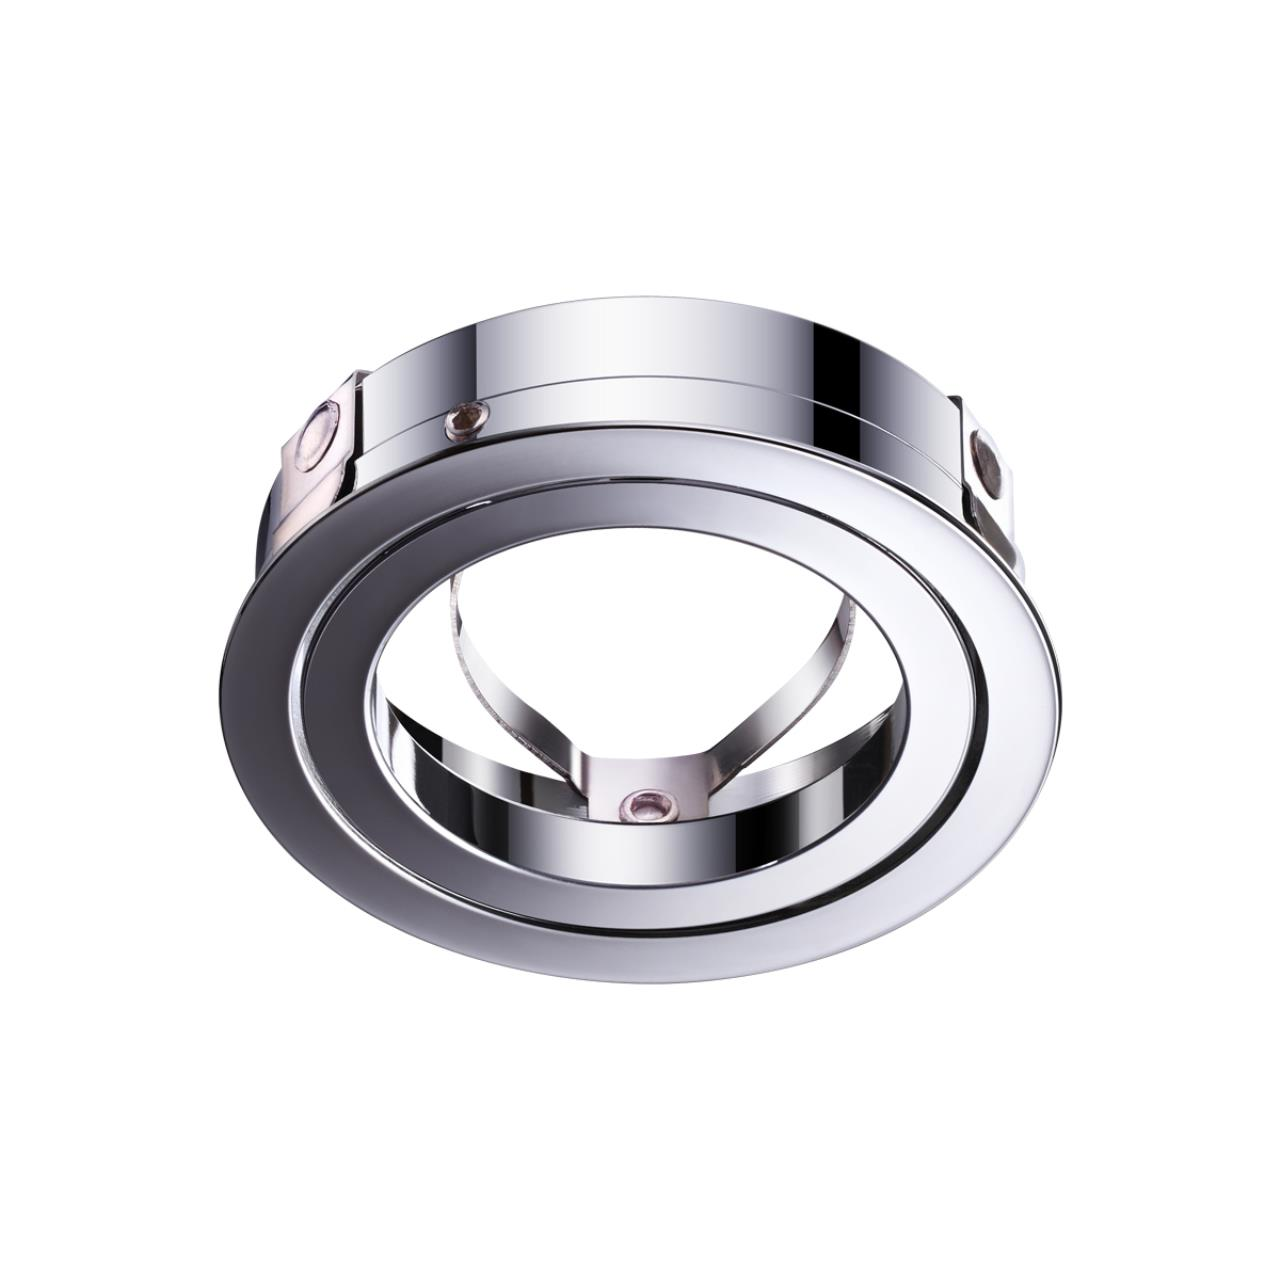 370459 KONST NT19 032 хром Крепежное кольцо для арт. 370455-370456 MECANO